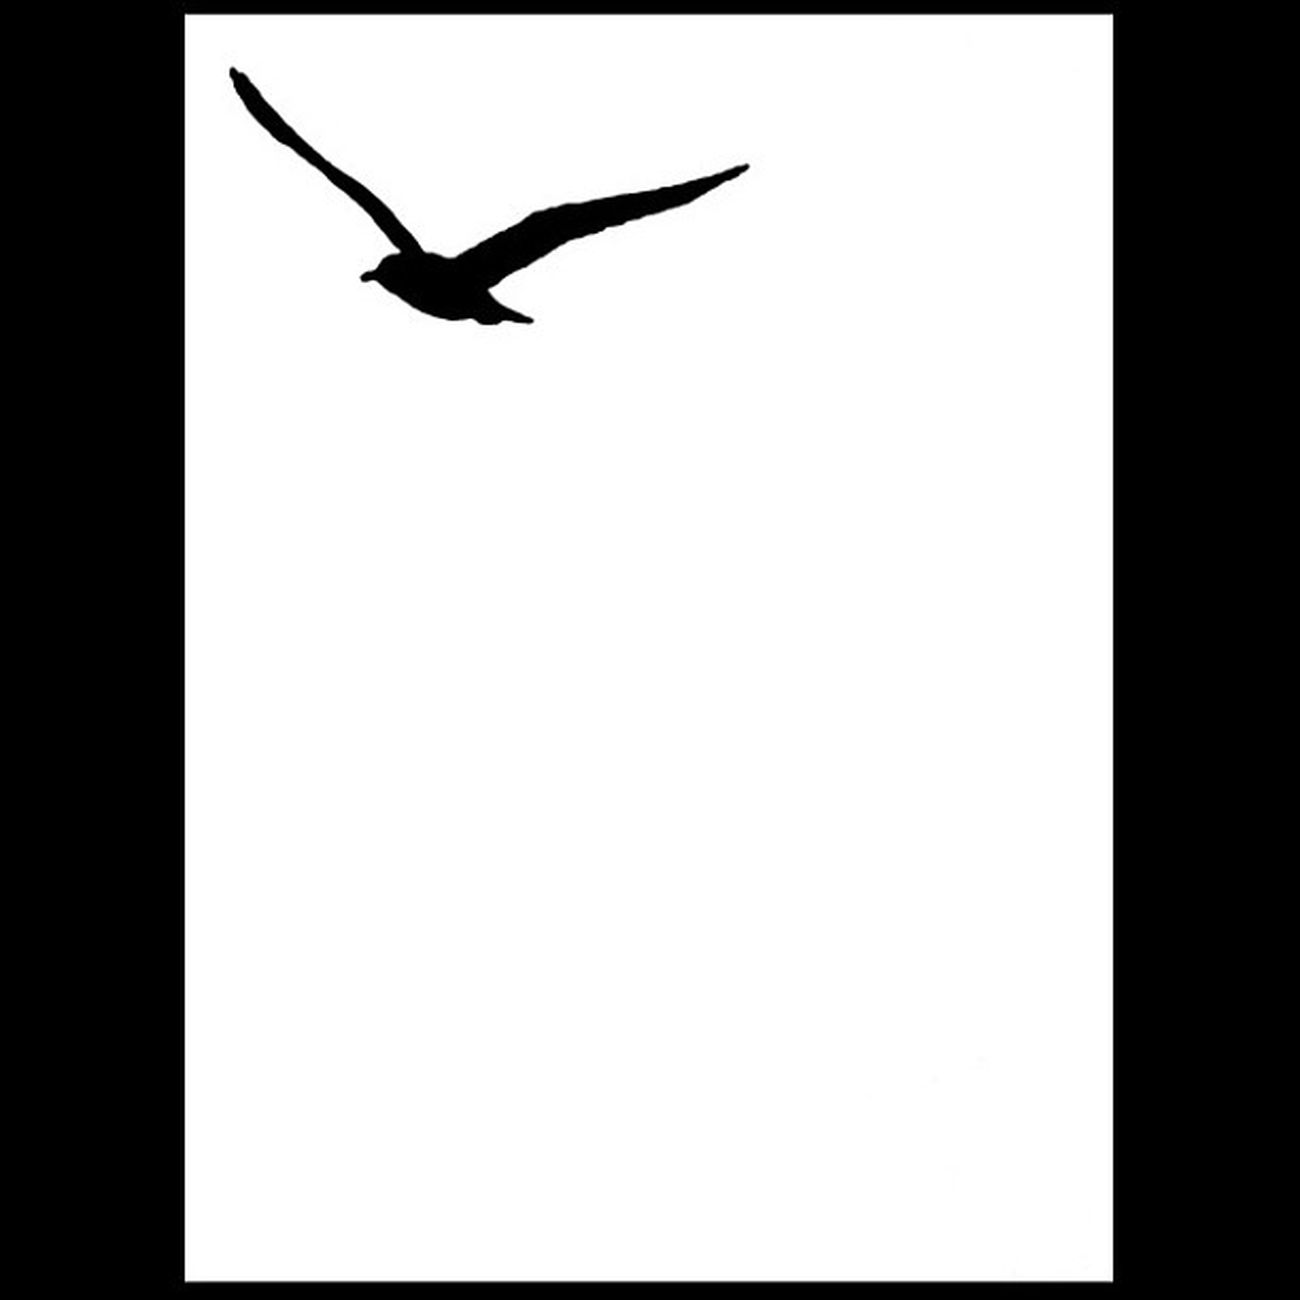 #bw #bnw #bw_crew #bwfever #bnw_life #bw_lovers #bwmasters #blackandwhite #monoart #most_deserving_bw #ic_bw #irox_bw #insta_crew_bw Nothinisordinary Igminimal Blackandwhite Insta_crew_bw Bw Bnw Monoart Bwmasters Bw_lovers Irox_bw Bw_crew Ic_bw Bwfever Most_deserving_bw Bnw_worldwide Bnw_life Minimal2_nio